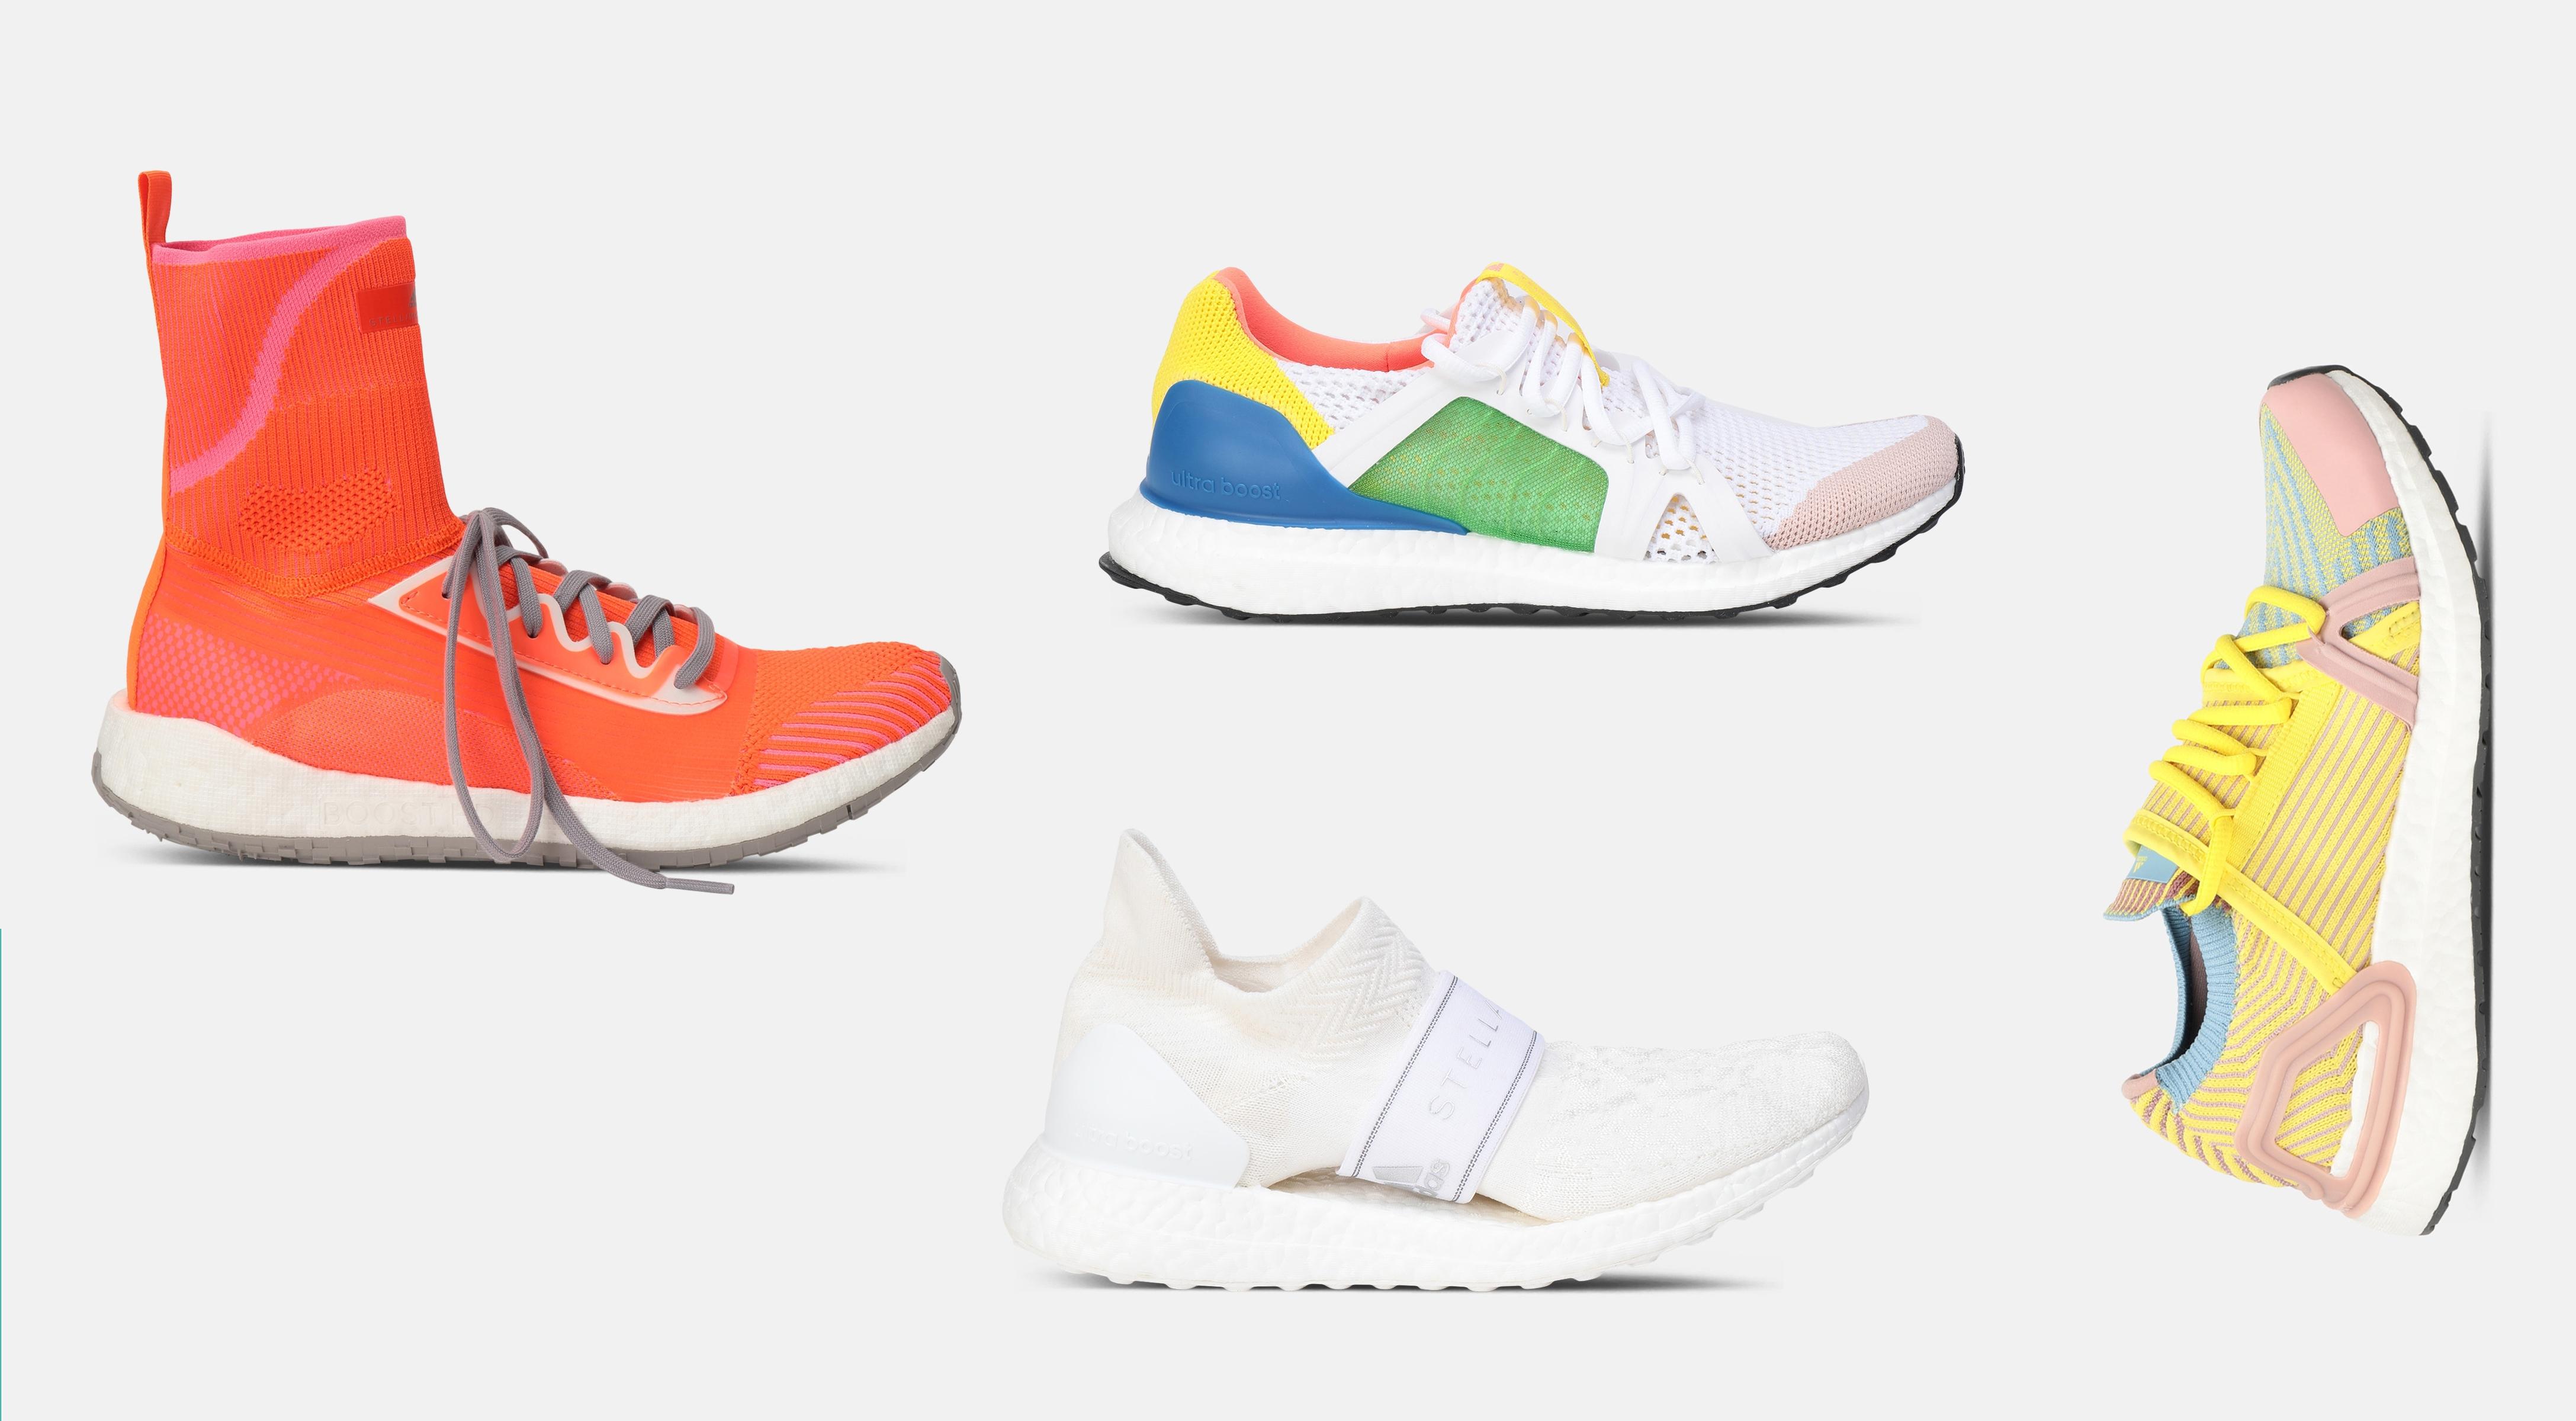 11828697li_13_c_adidas-footwear_adidas-footwear-copia-copia